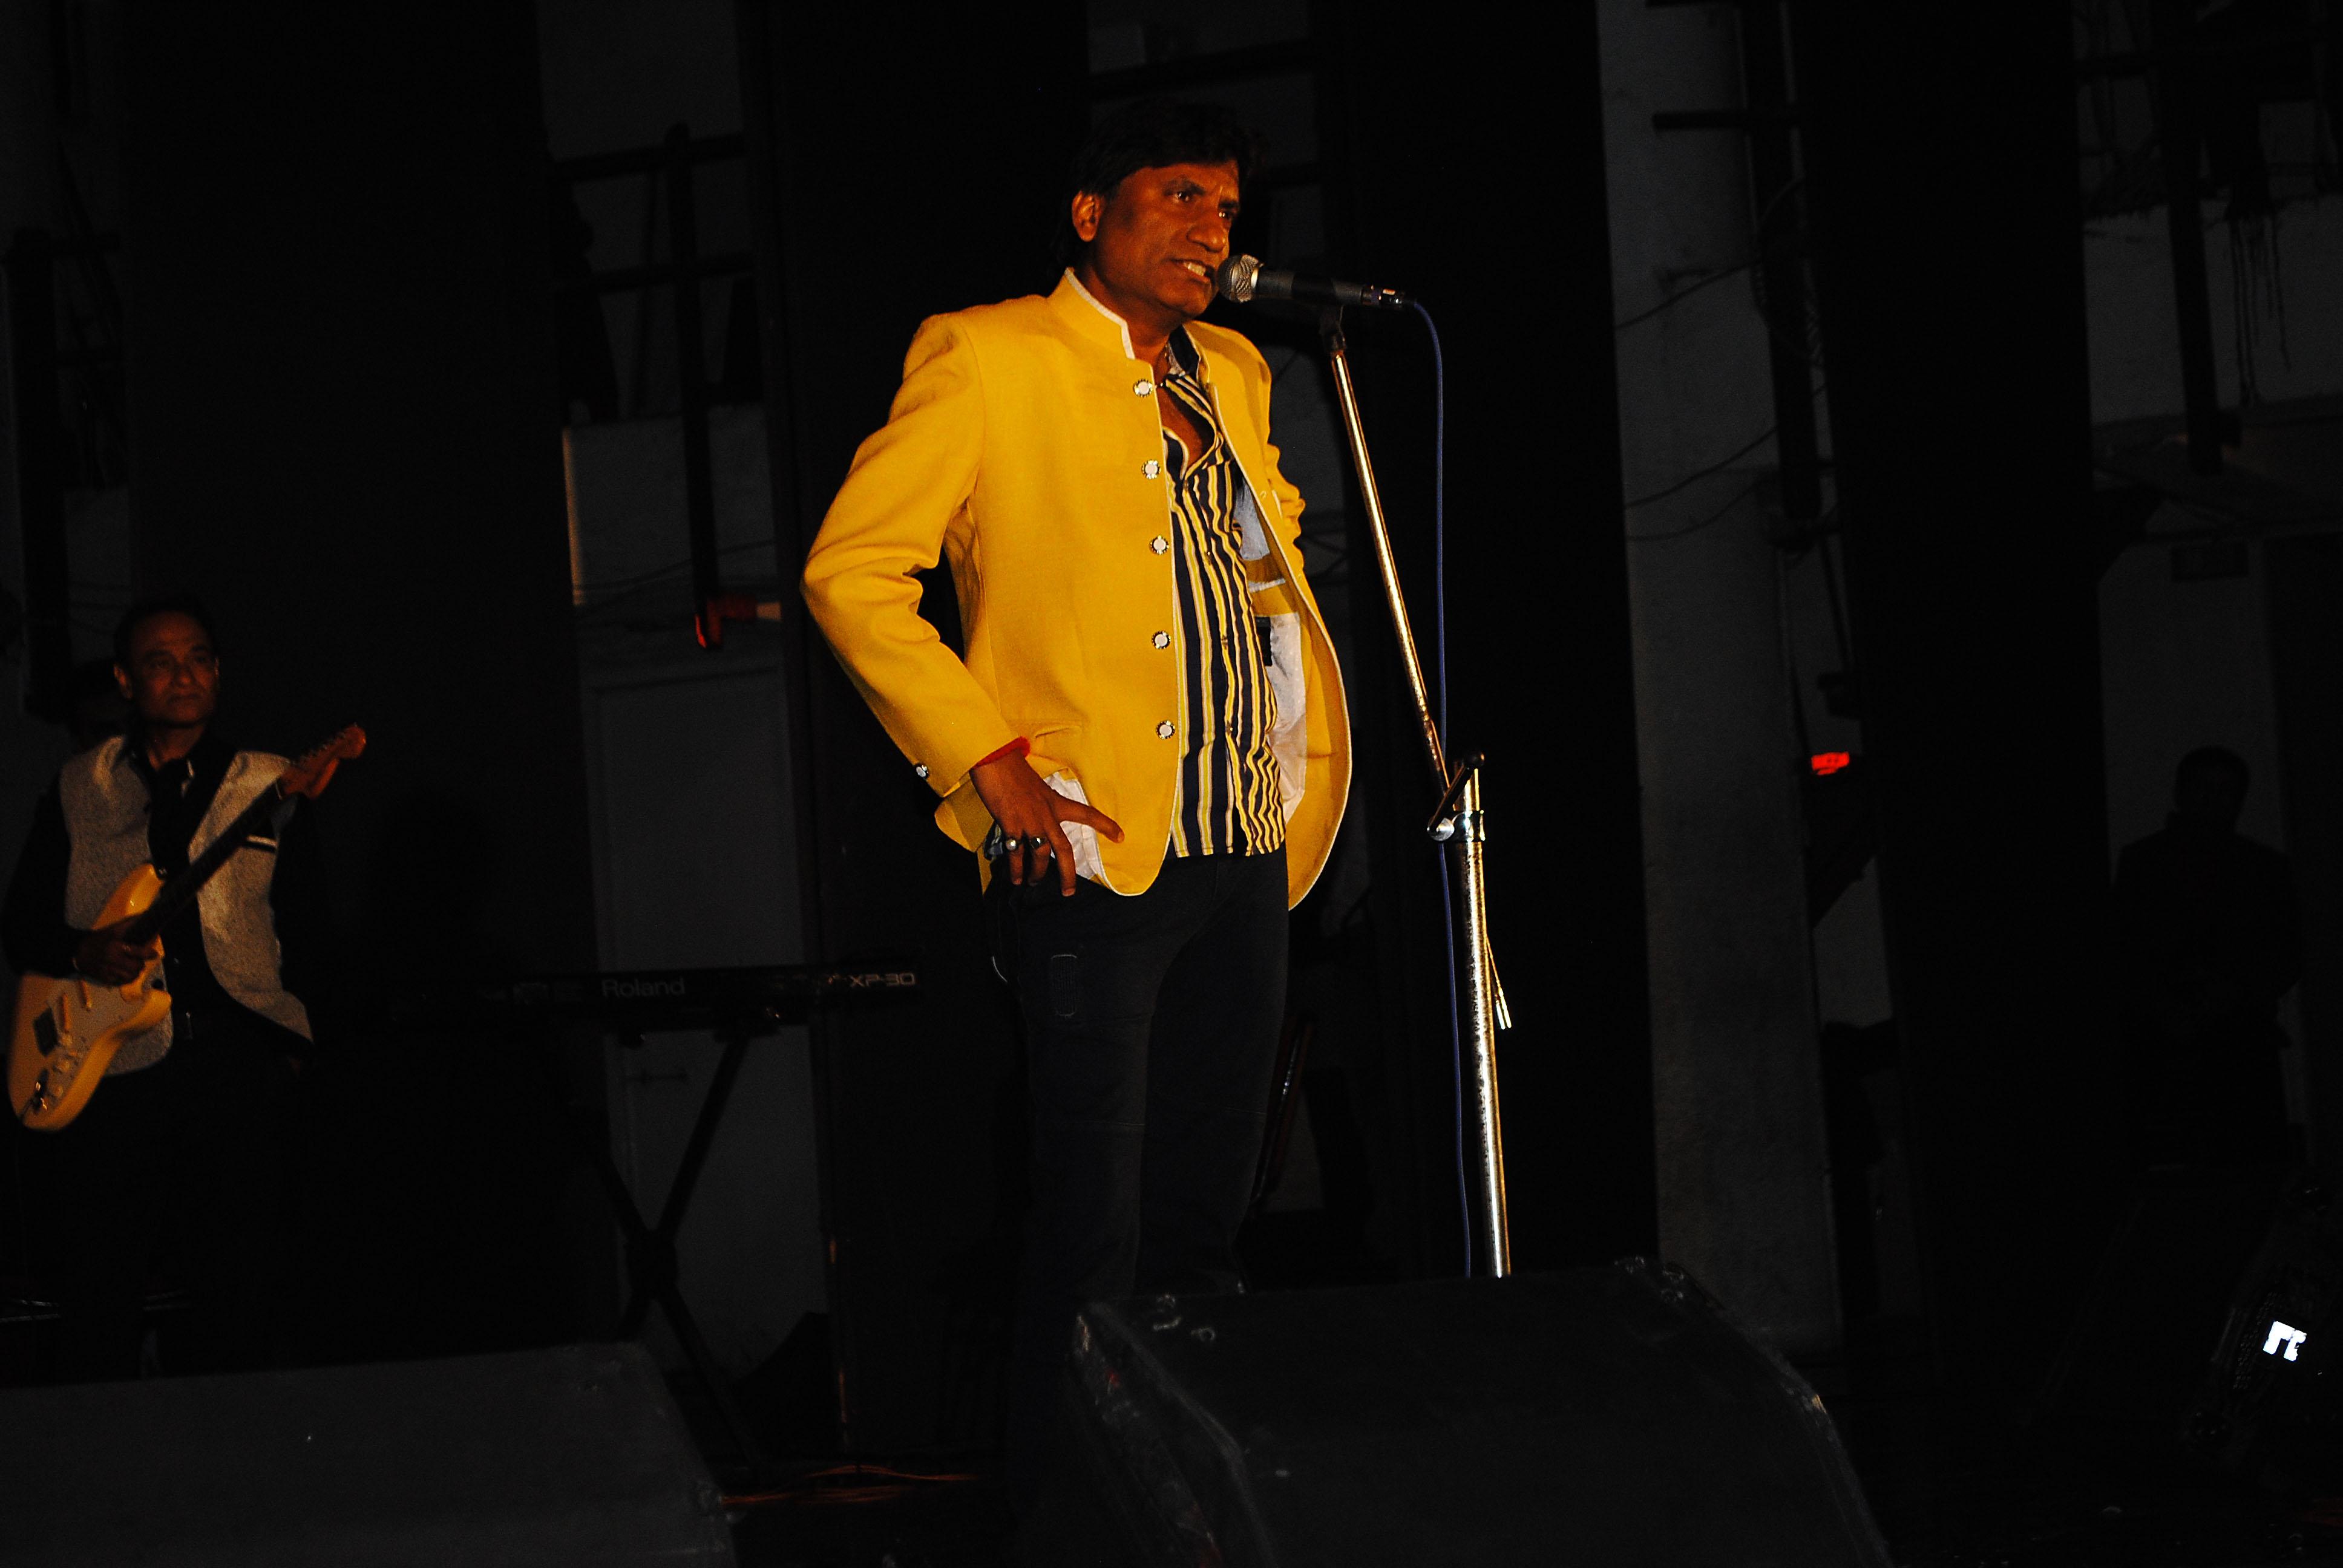 Comedian Raju Srivastav Entertain the Cancer Patient